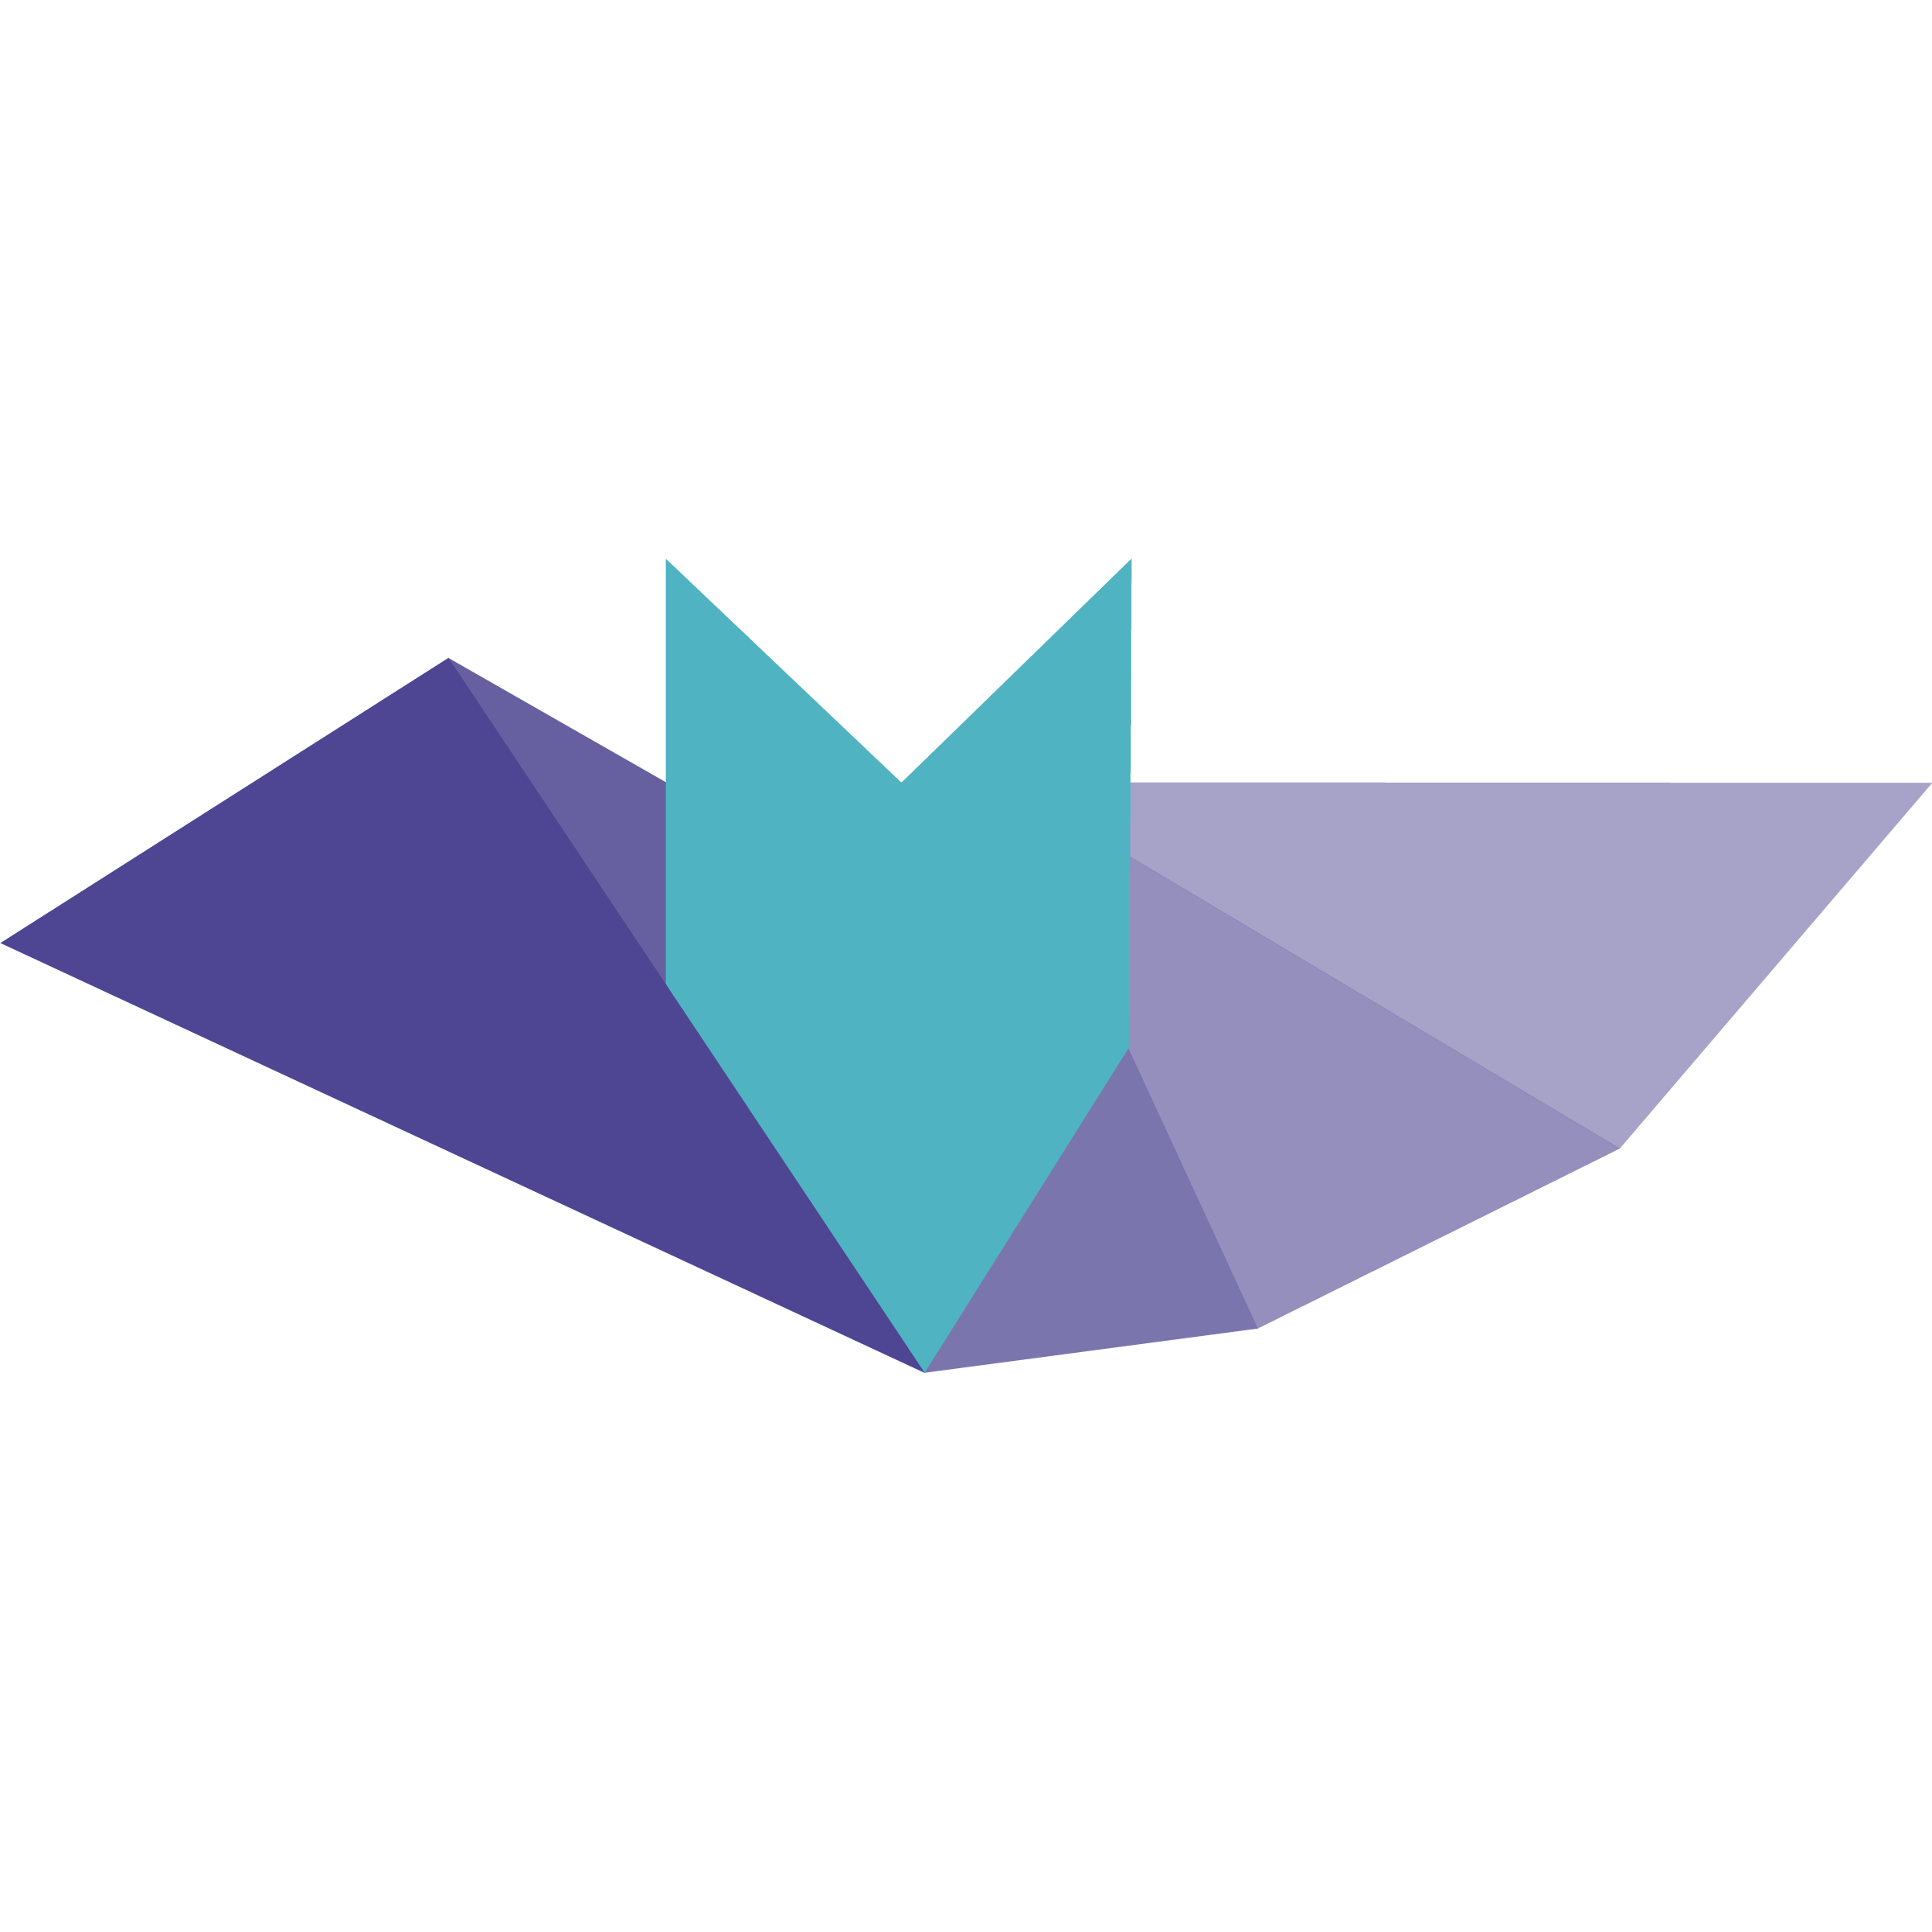 Octobat logo